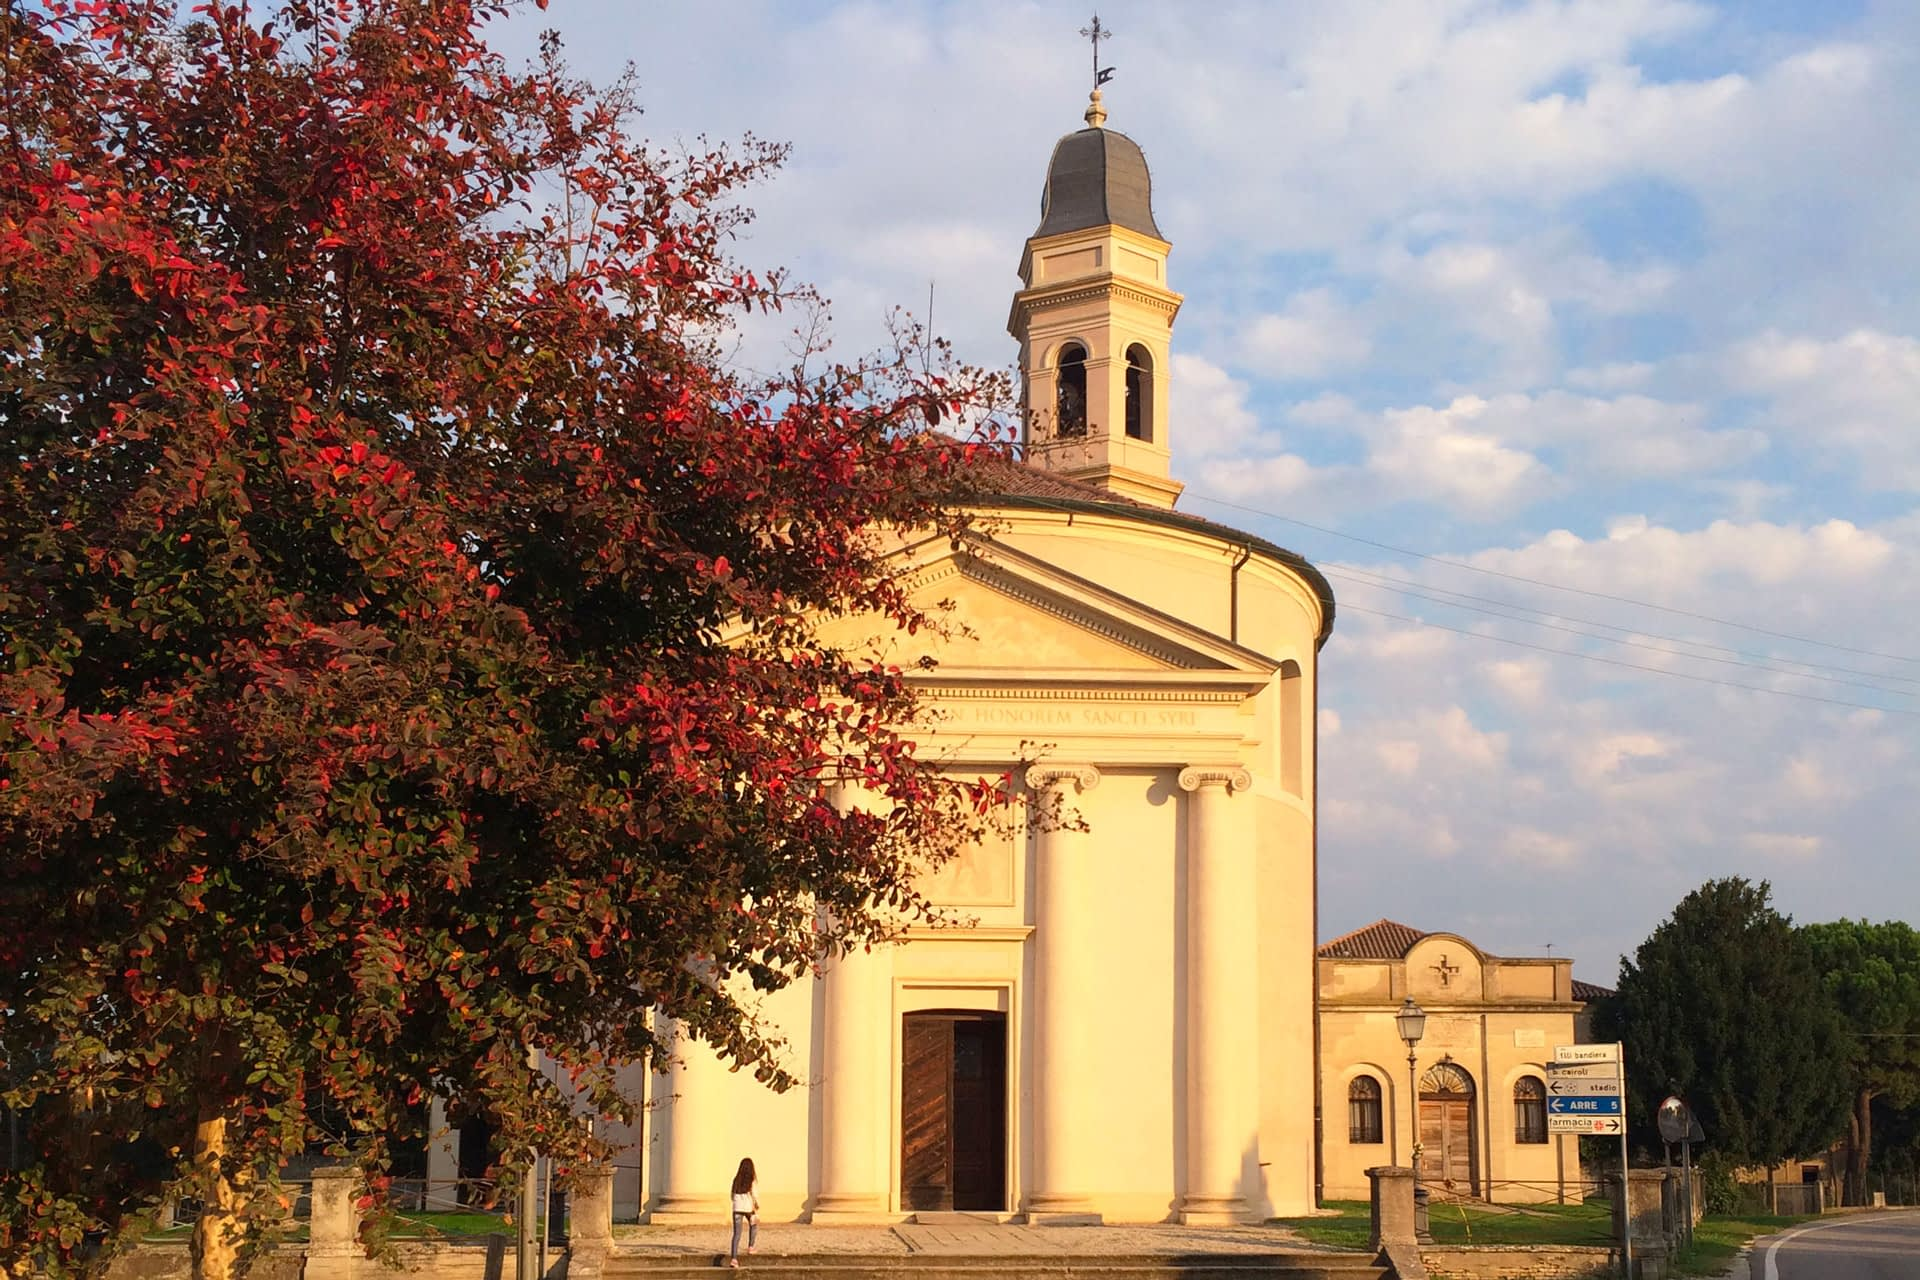 Bagnoli di Sopra_Chiesa di San Siro